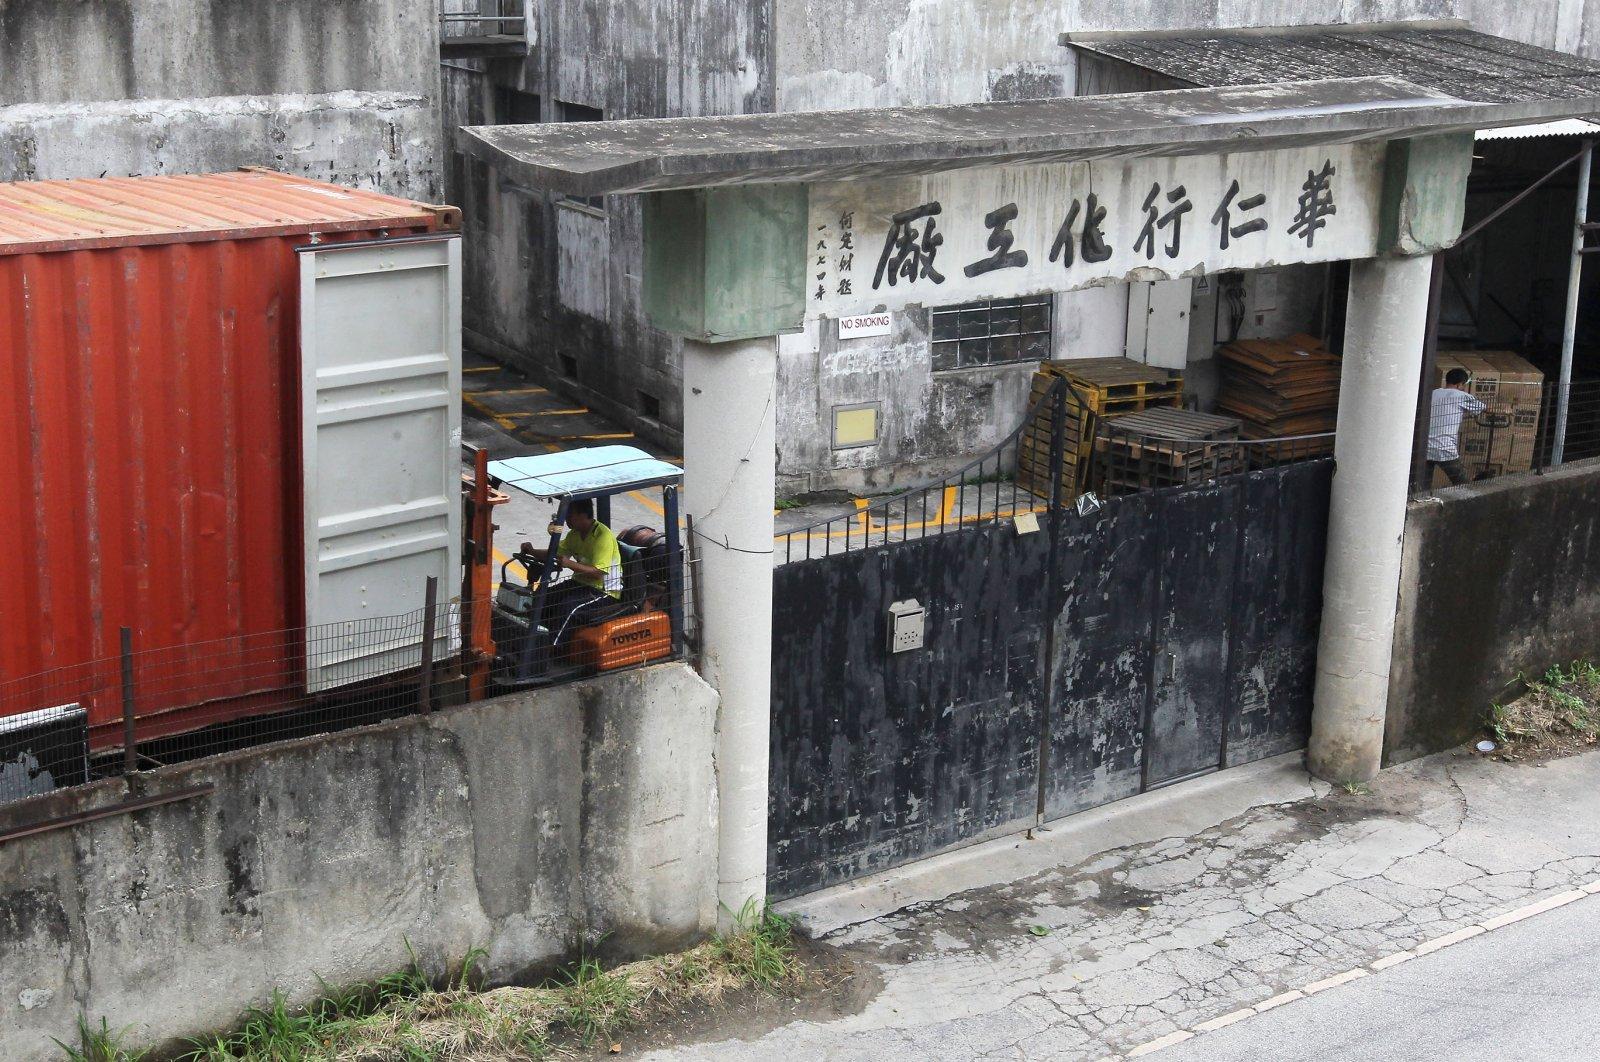 Wah Yan Hong Chemical Factory is located in Kwu Tong, Hong Kong, China, Aug. 2, 2013. (Getty Images)